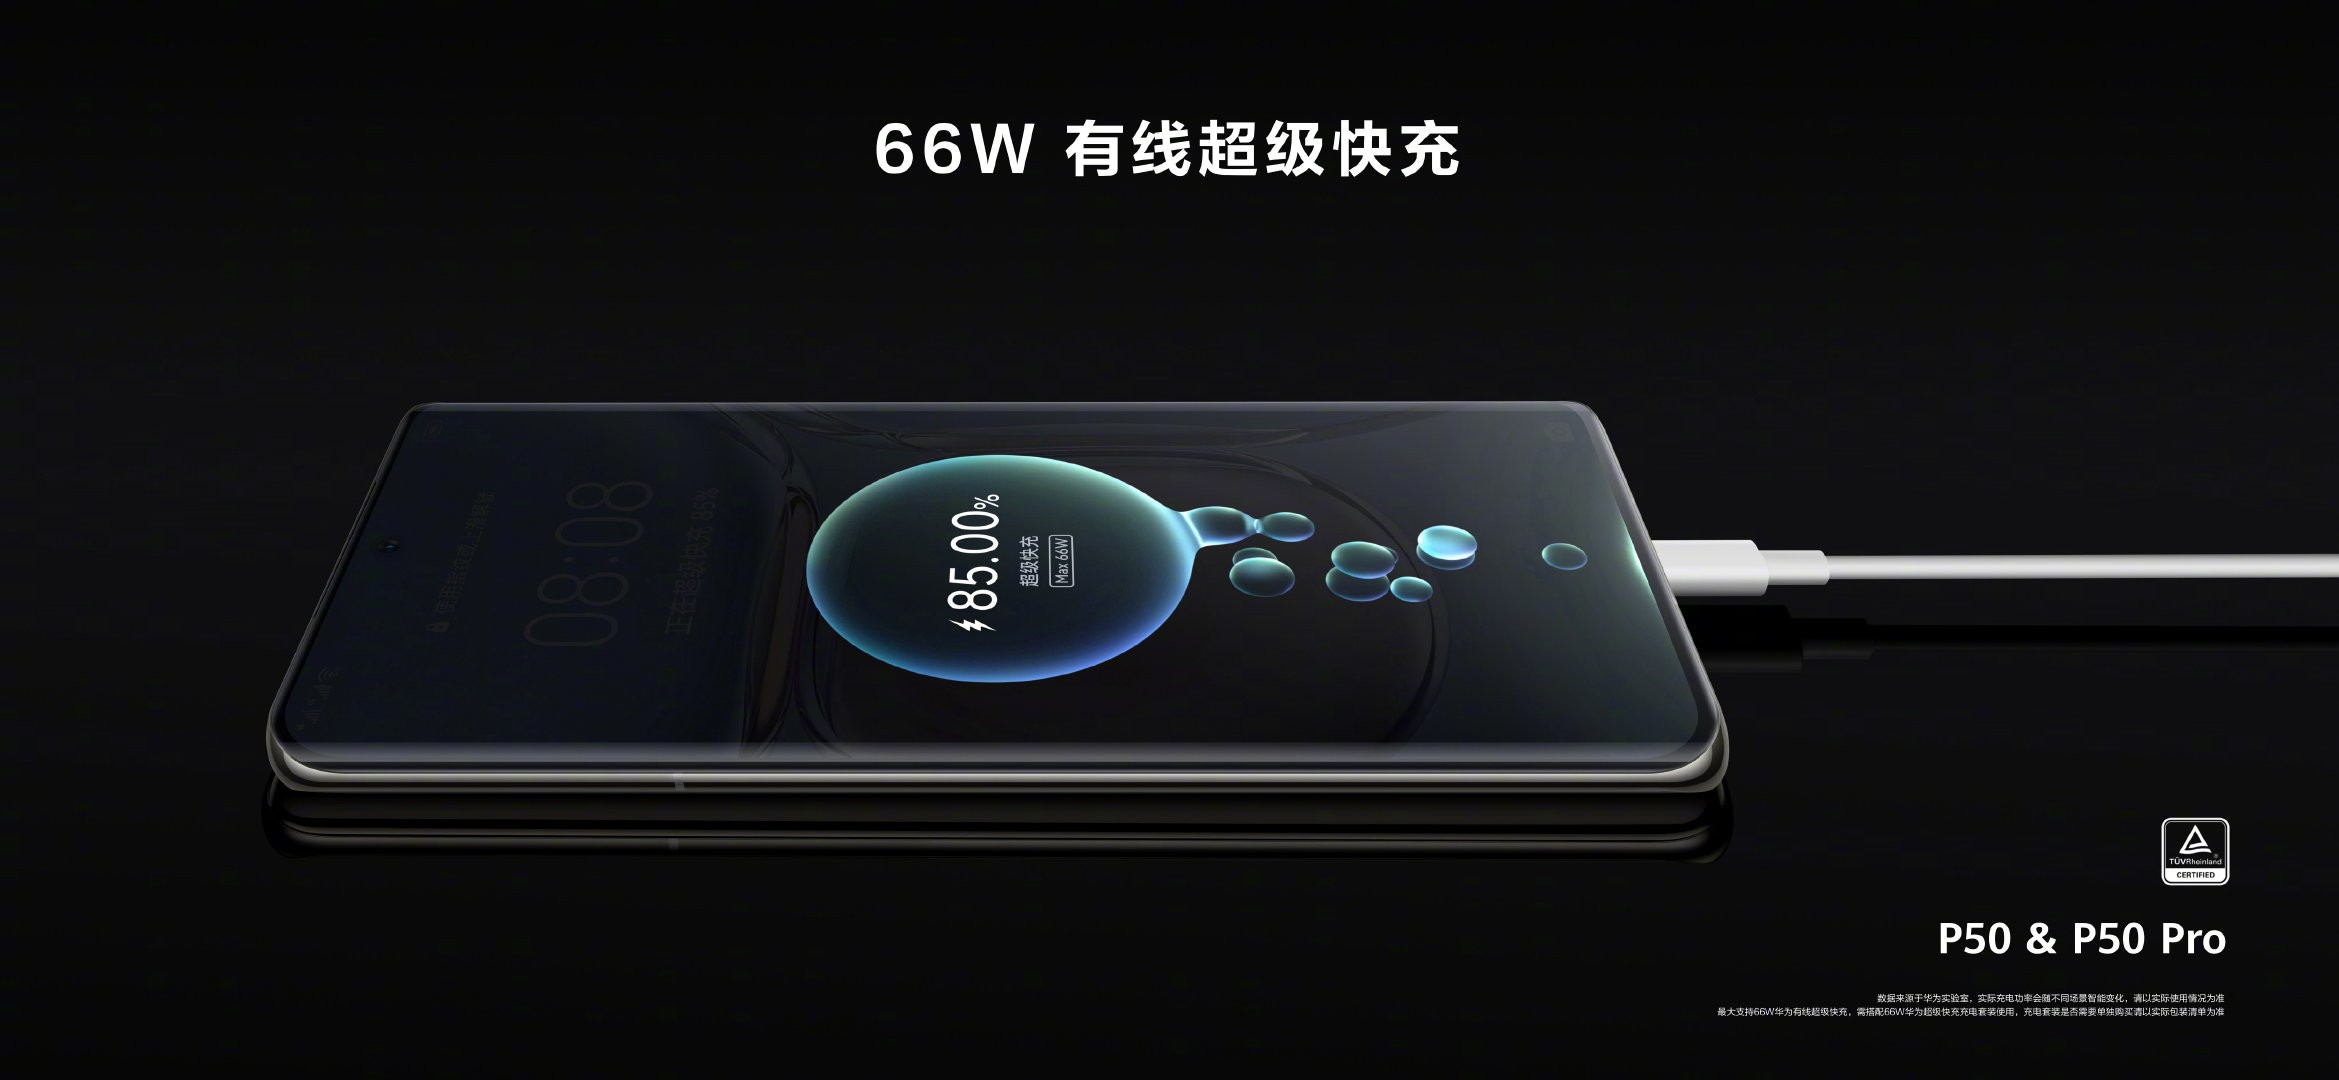 Huawei P50 Huawei P50 Pro cijena specifikacije